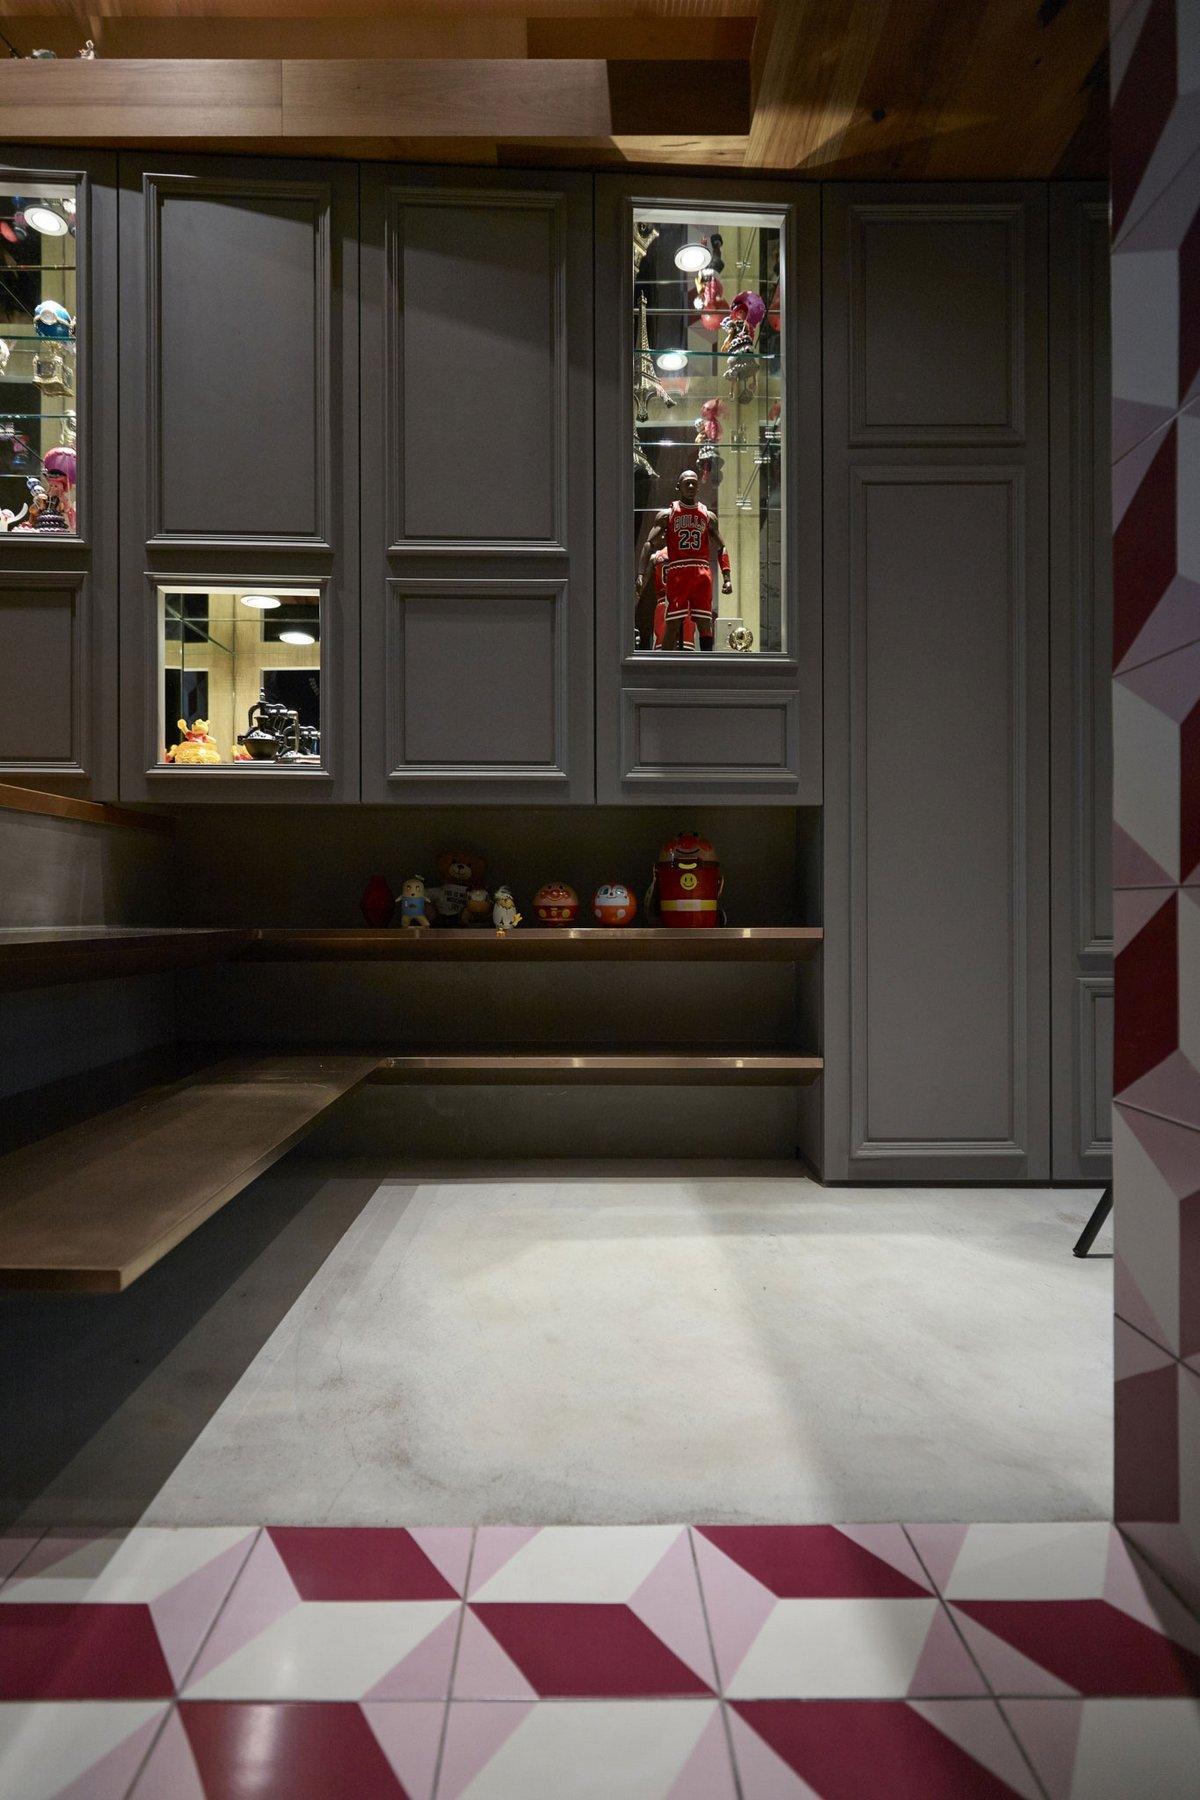 KC Design Studio, мезонин квартира, необычный интерьер квартиры, необычные интерьеры квартир фото, многоуровневая квартира